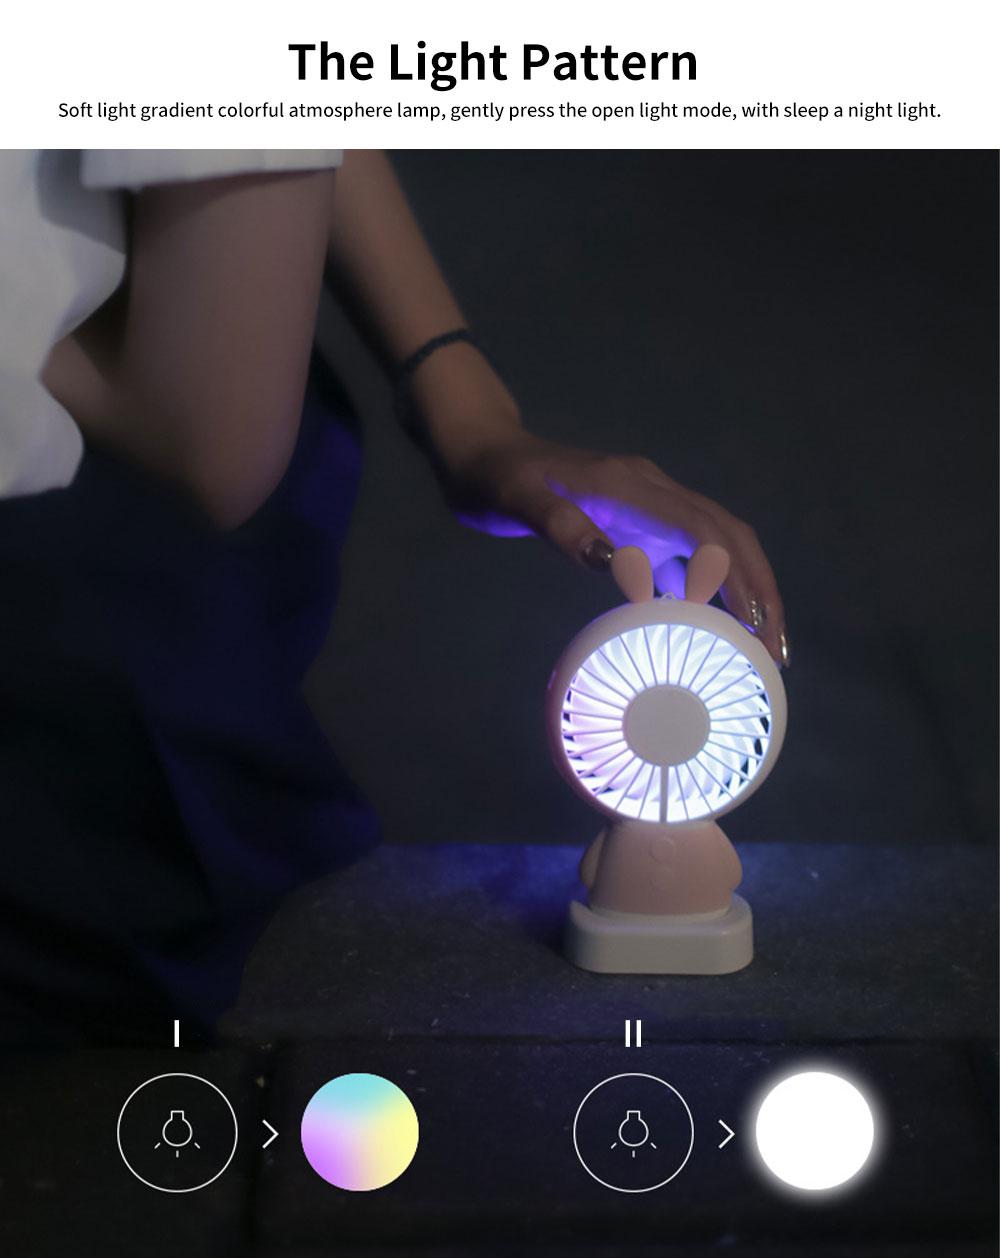 New Rabbit Mini Handheld Fan, Dharma Bear Night Light USB Charging Fan, Outdoor Compact and Convenient Electric Fan 4